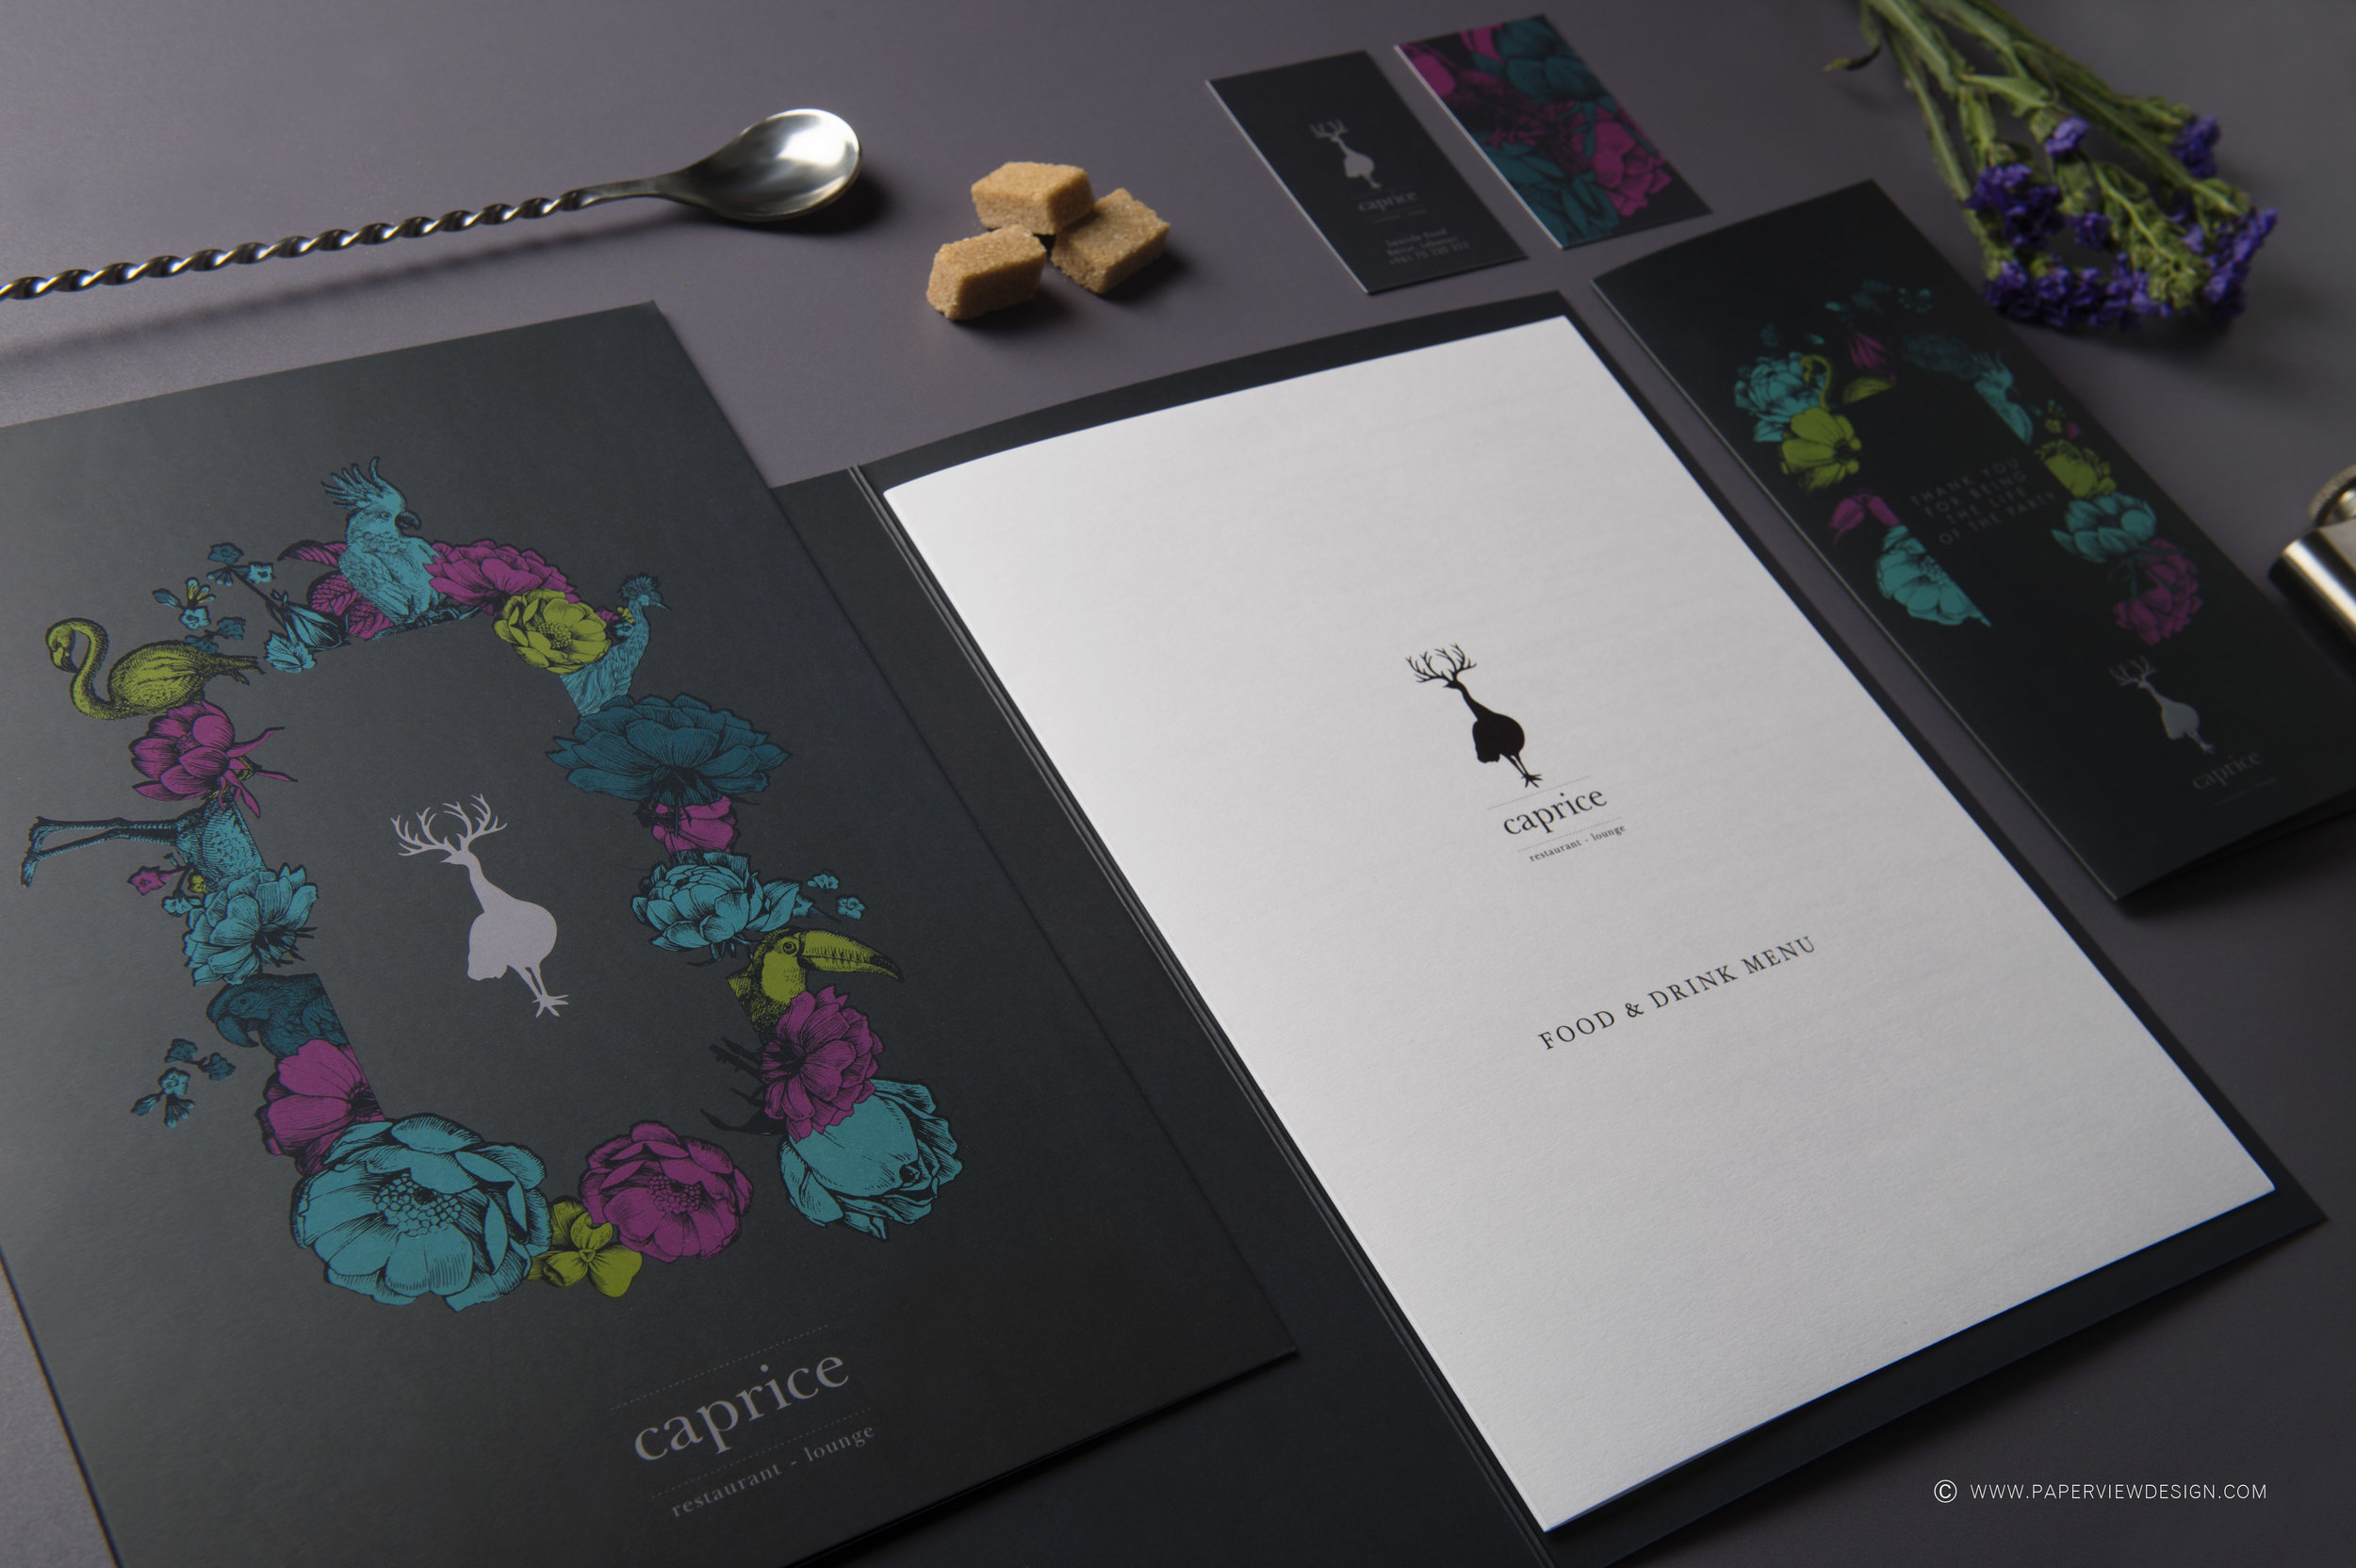 Caprice-Cover-Menus-Inside-Sheet-Flower-Identity-Food-Drink-Menu-Branding-Photography